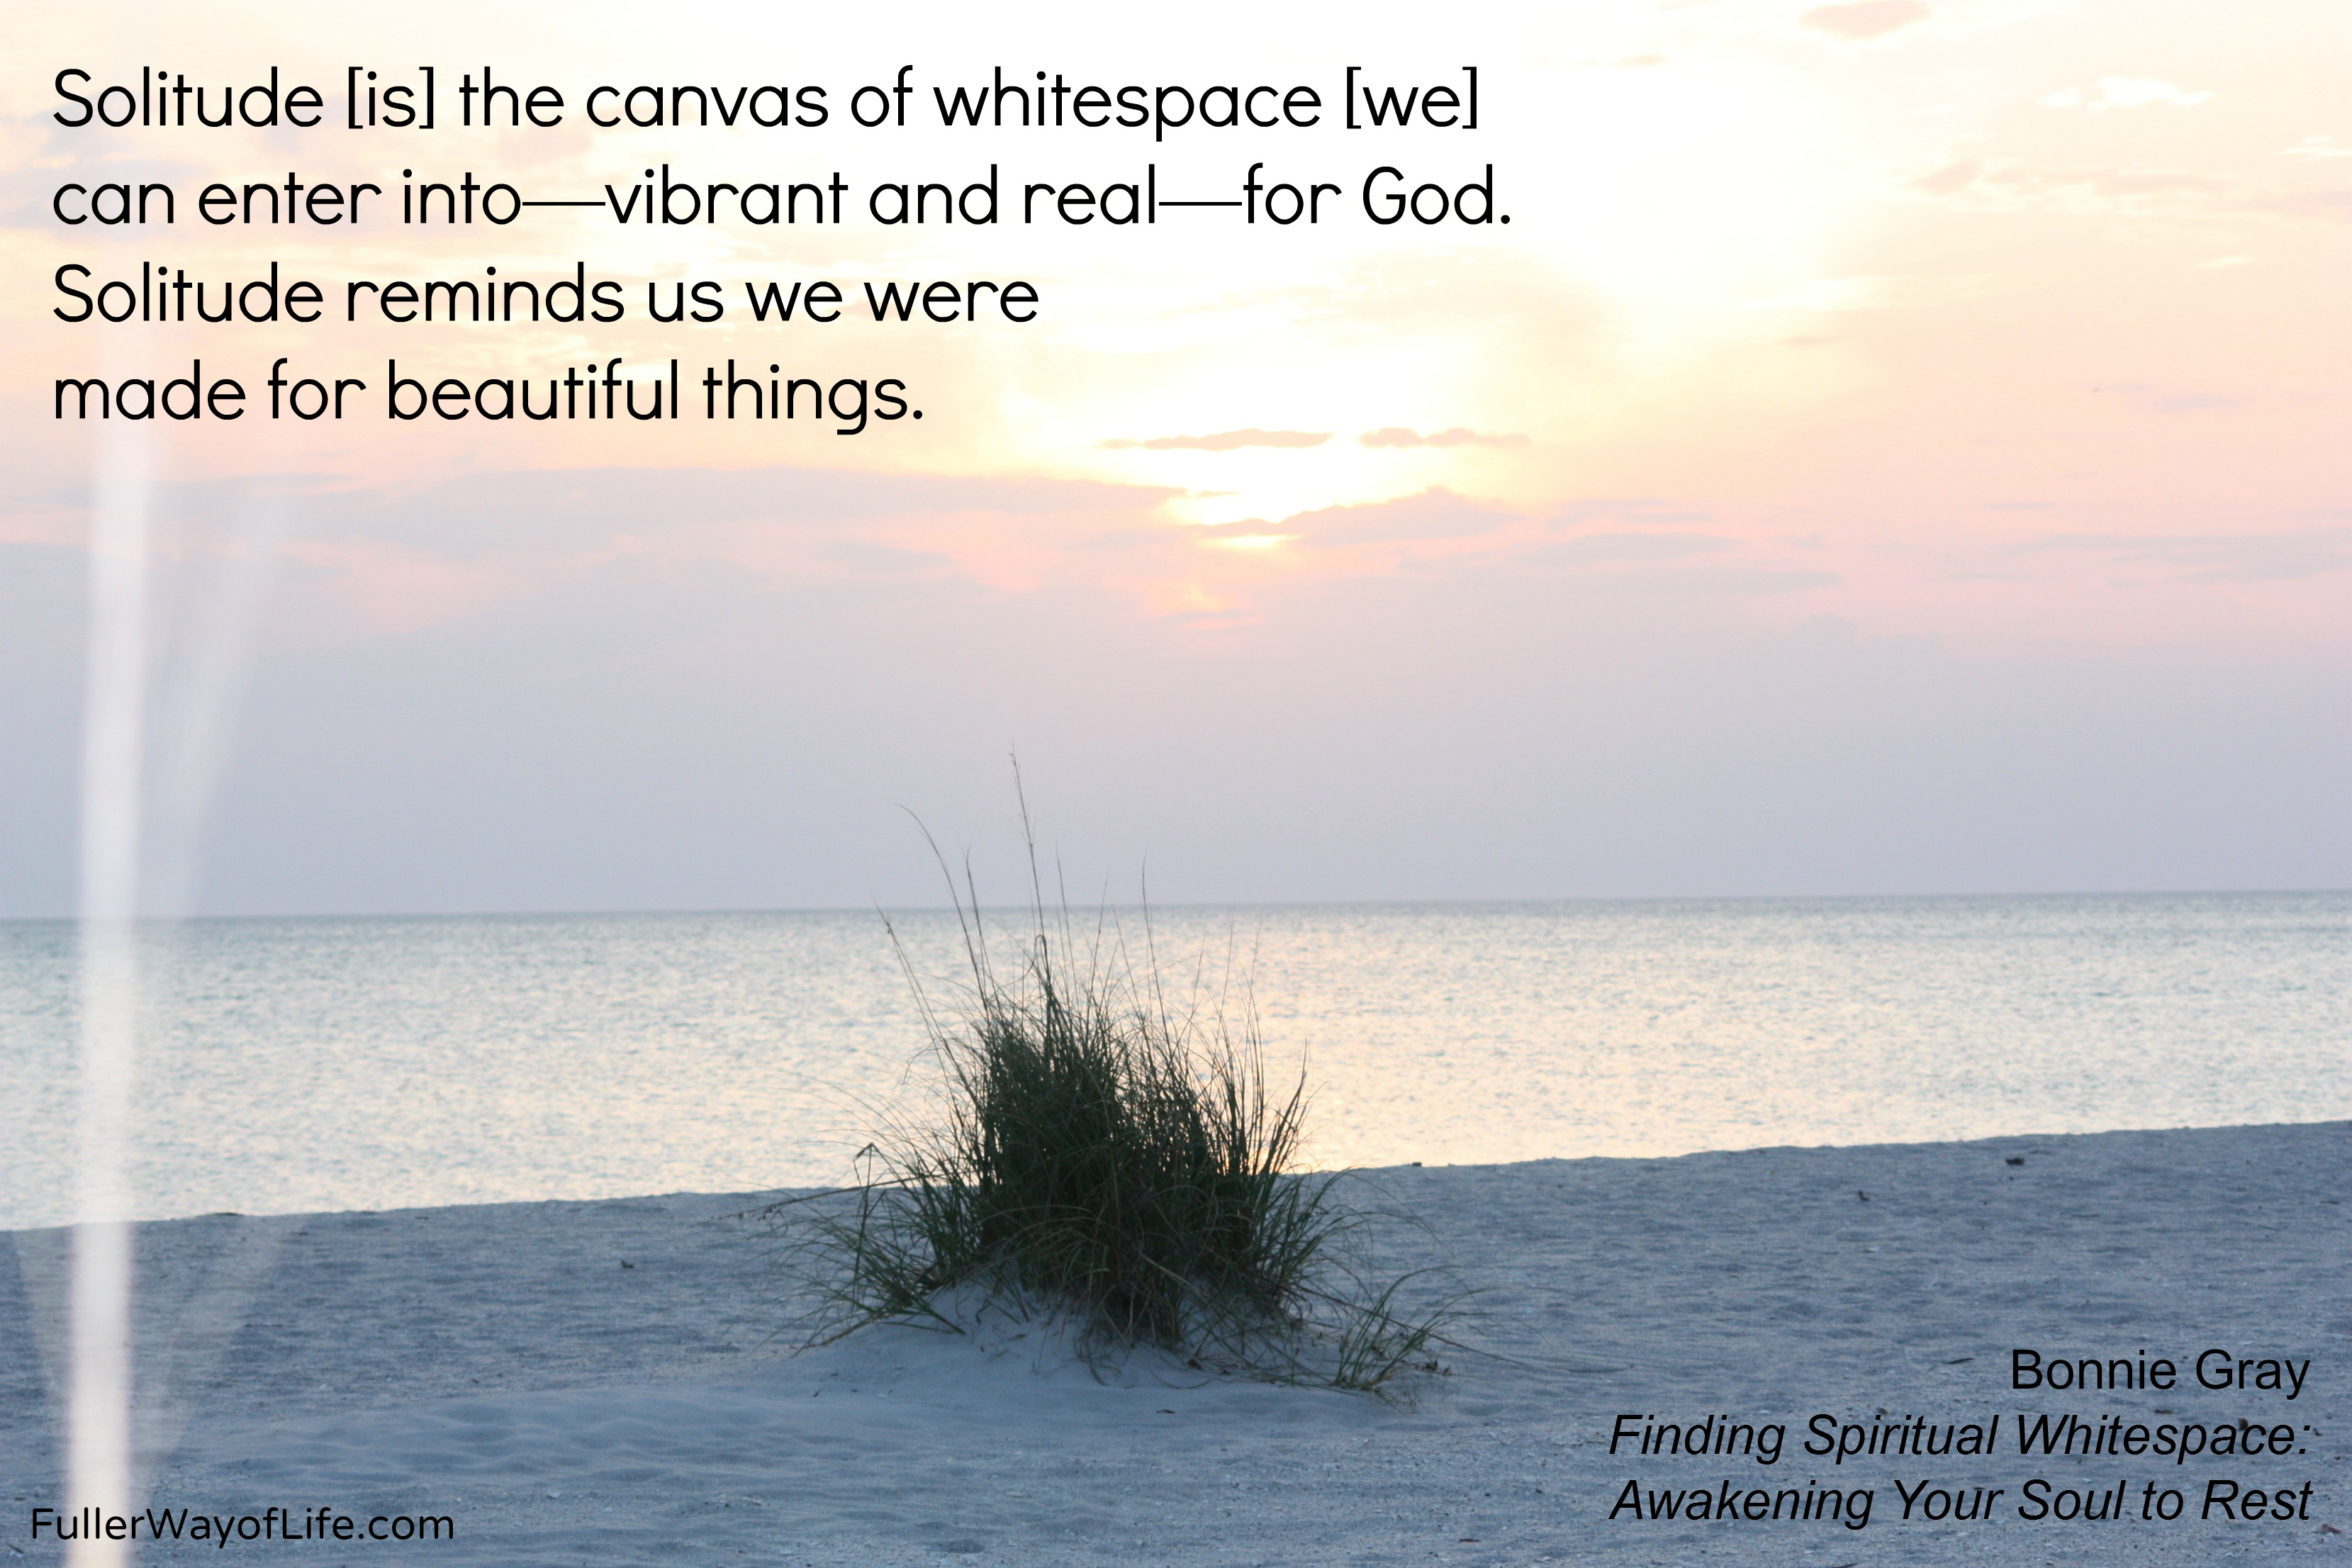 solitude   Fuller Way of Life